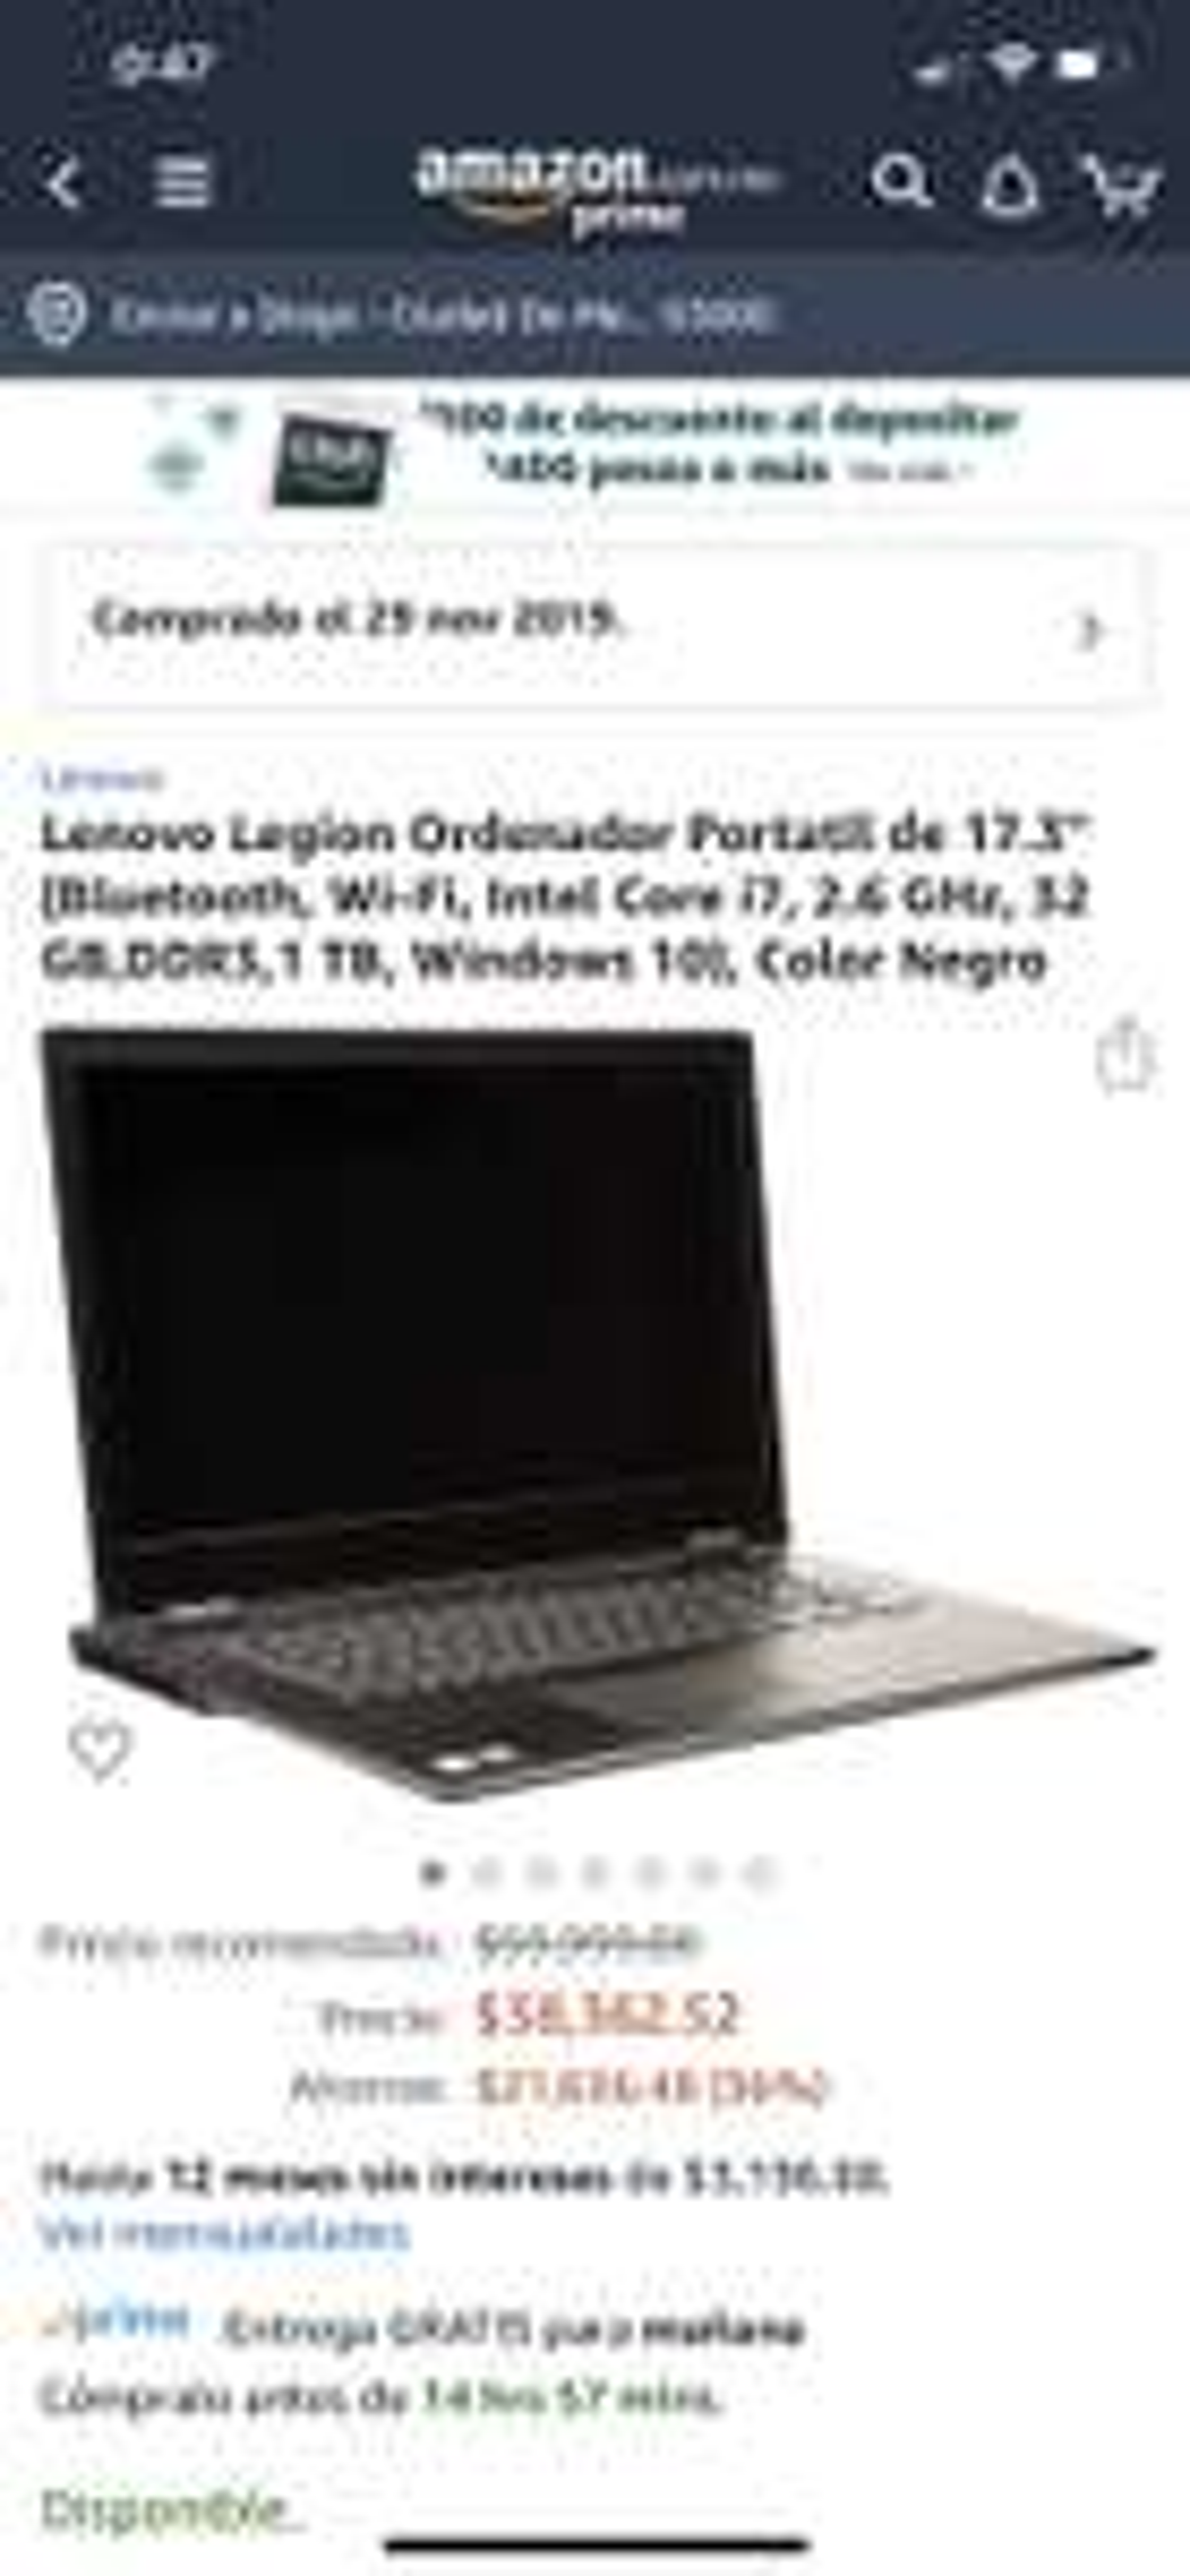 "Amazon: Lenovo Y740 17.3"", RTX 2070, 32gb ram, 1tb HD + 512 gb SSD, i7 9th (pagando con Amex o Banorte)"